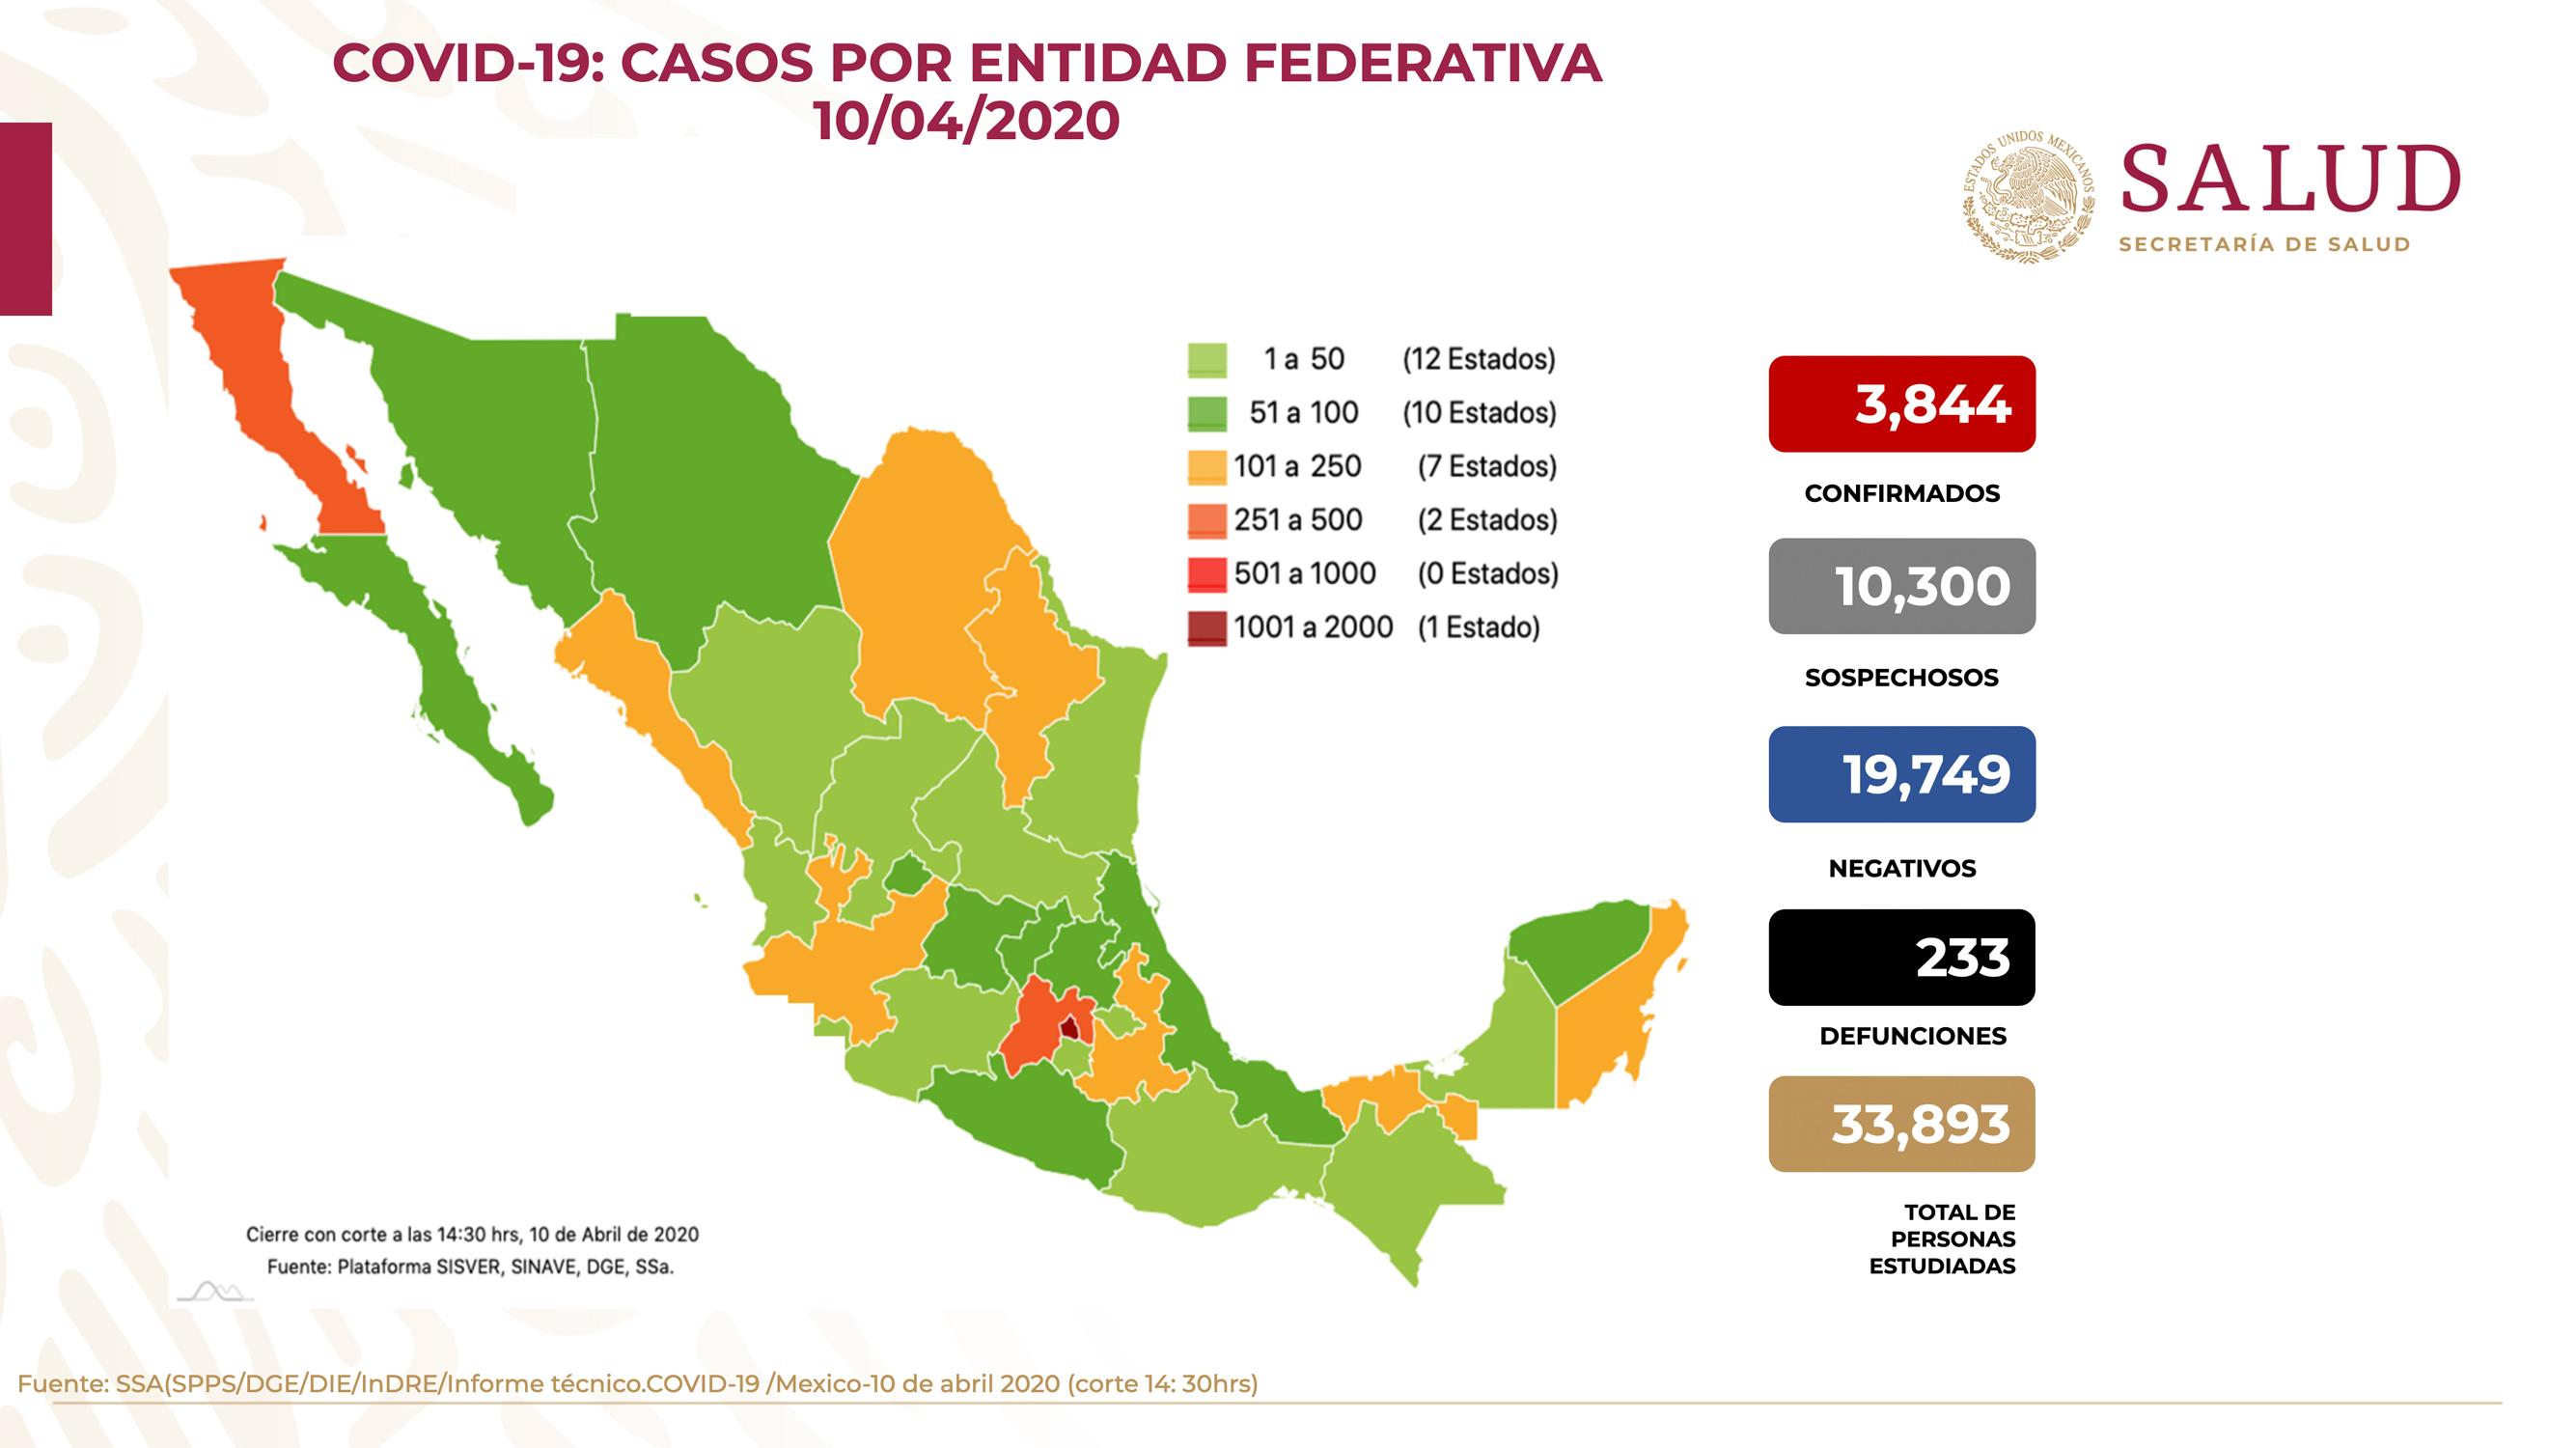 EN MÉXICO YA SON 3 MIL 844 CASOS CONFIRMADOS POR COVID-19